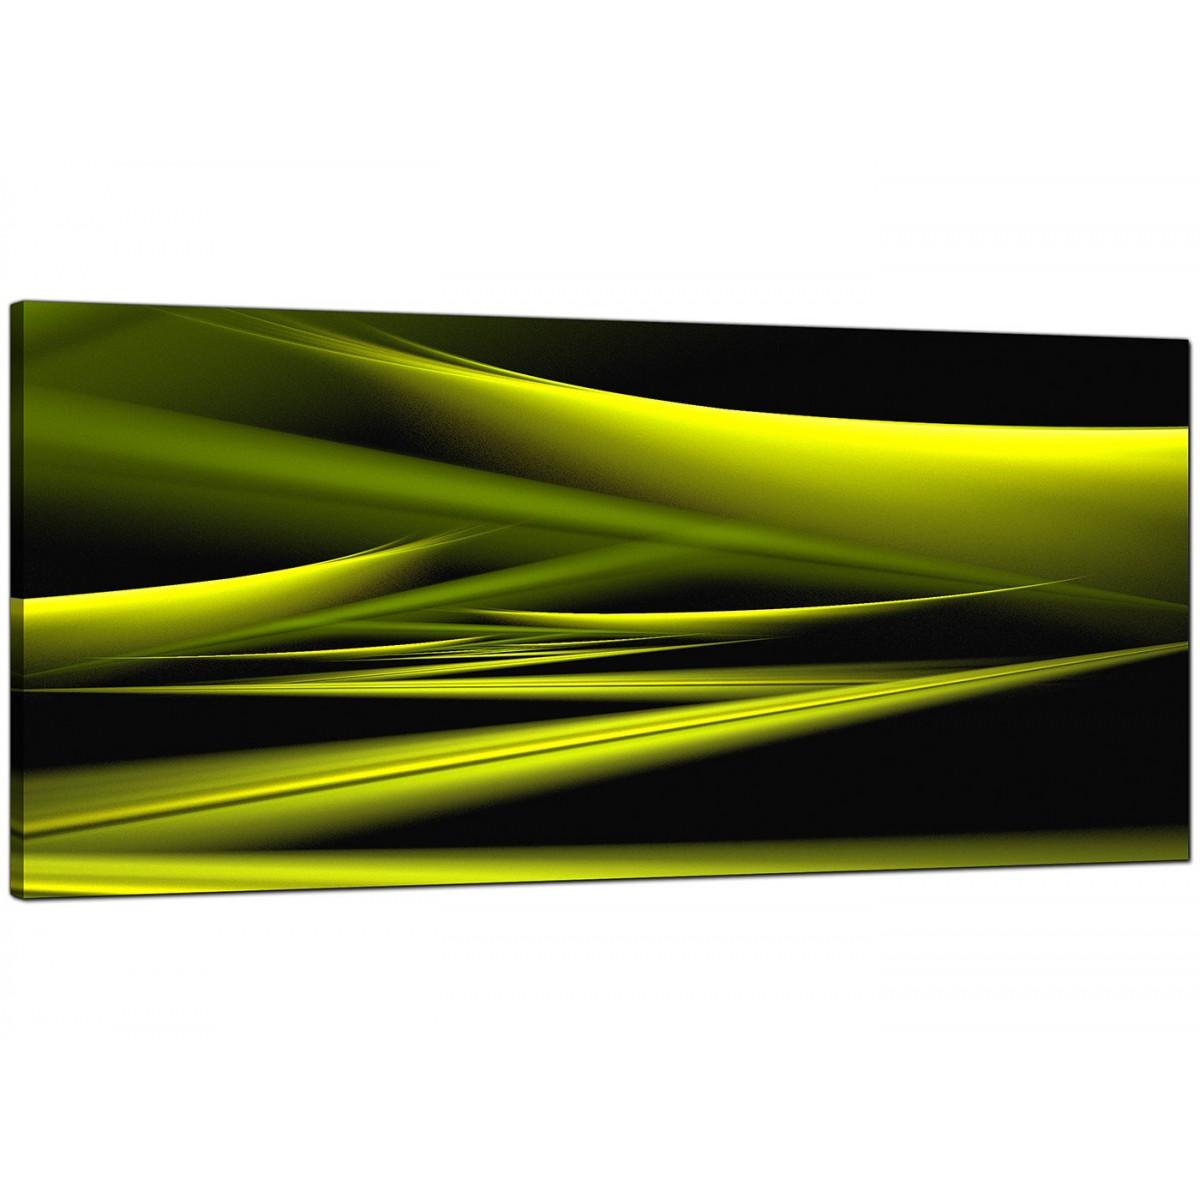 Green Abstract Canvas Prints 120cm X 50cm Lacid